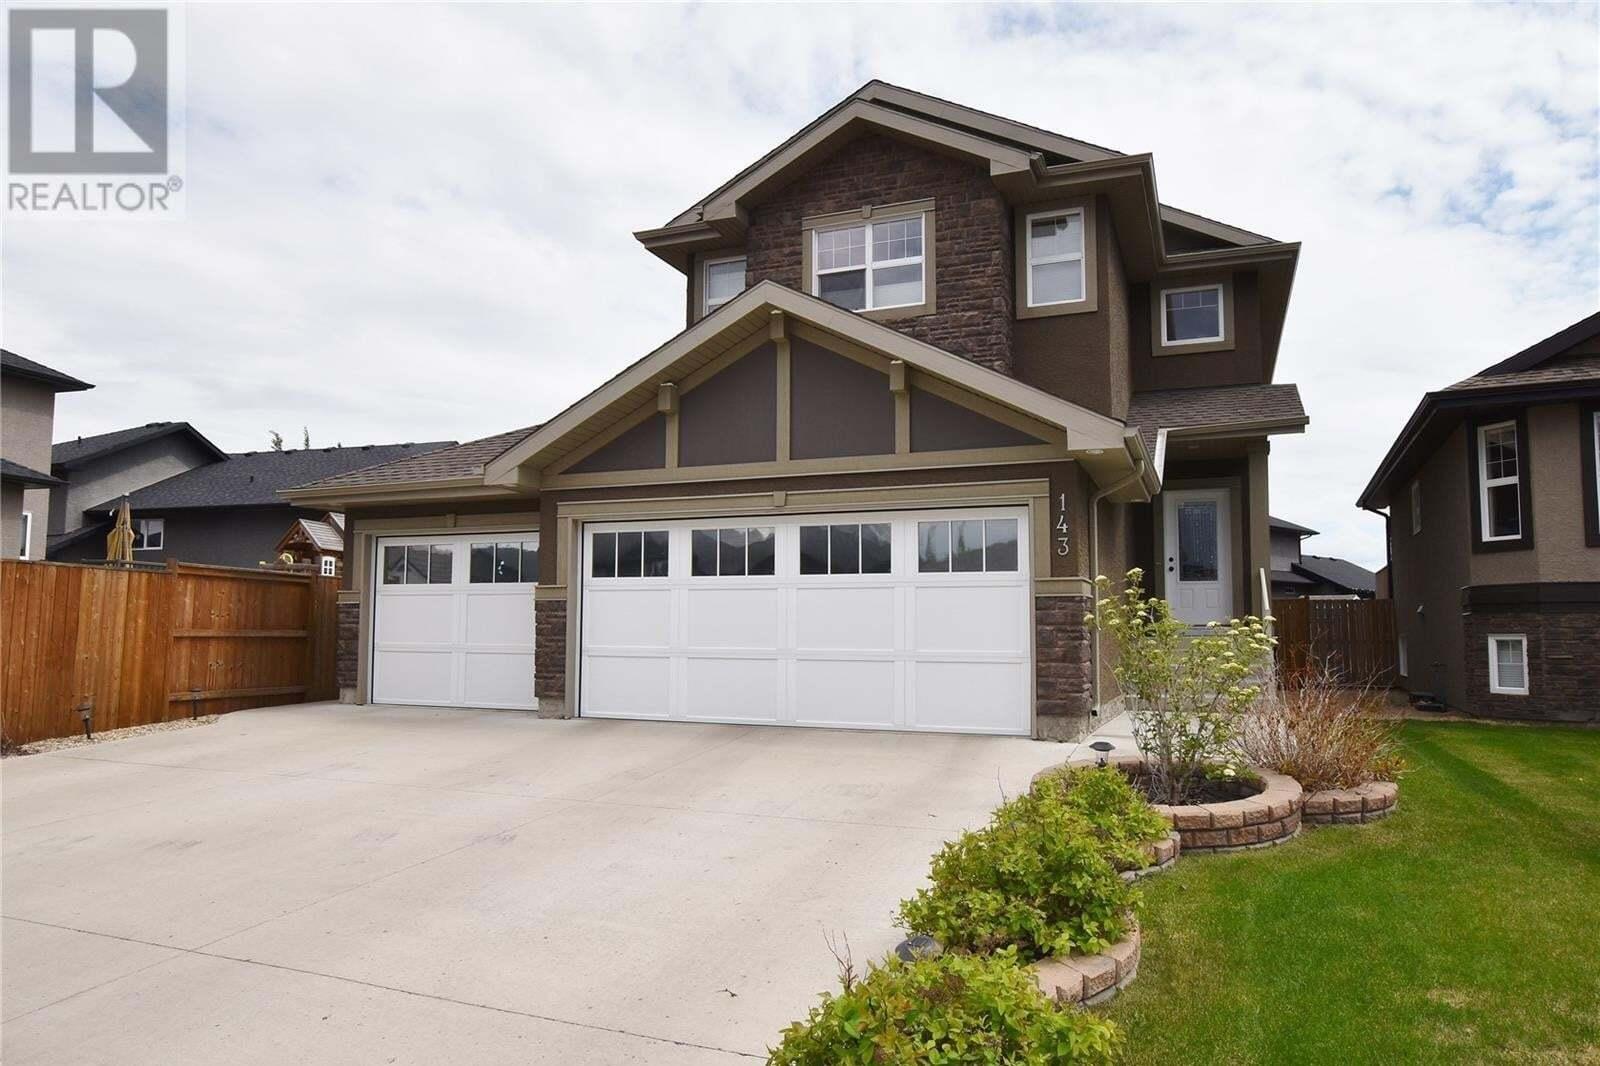 House for sale at 143 Senick Cres Saskatoon Saskatchewan - MLS: SK809780